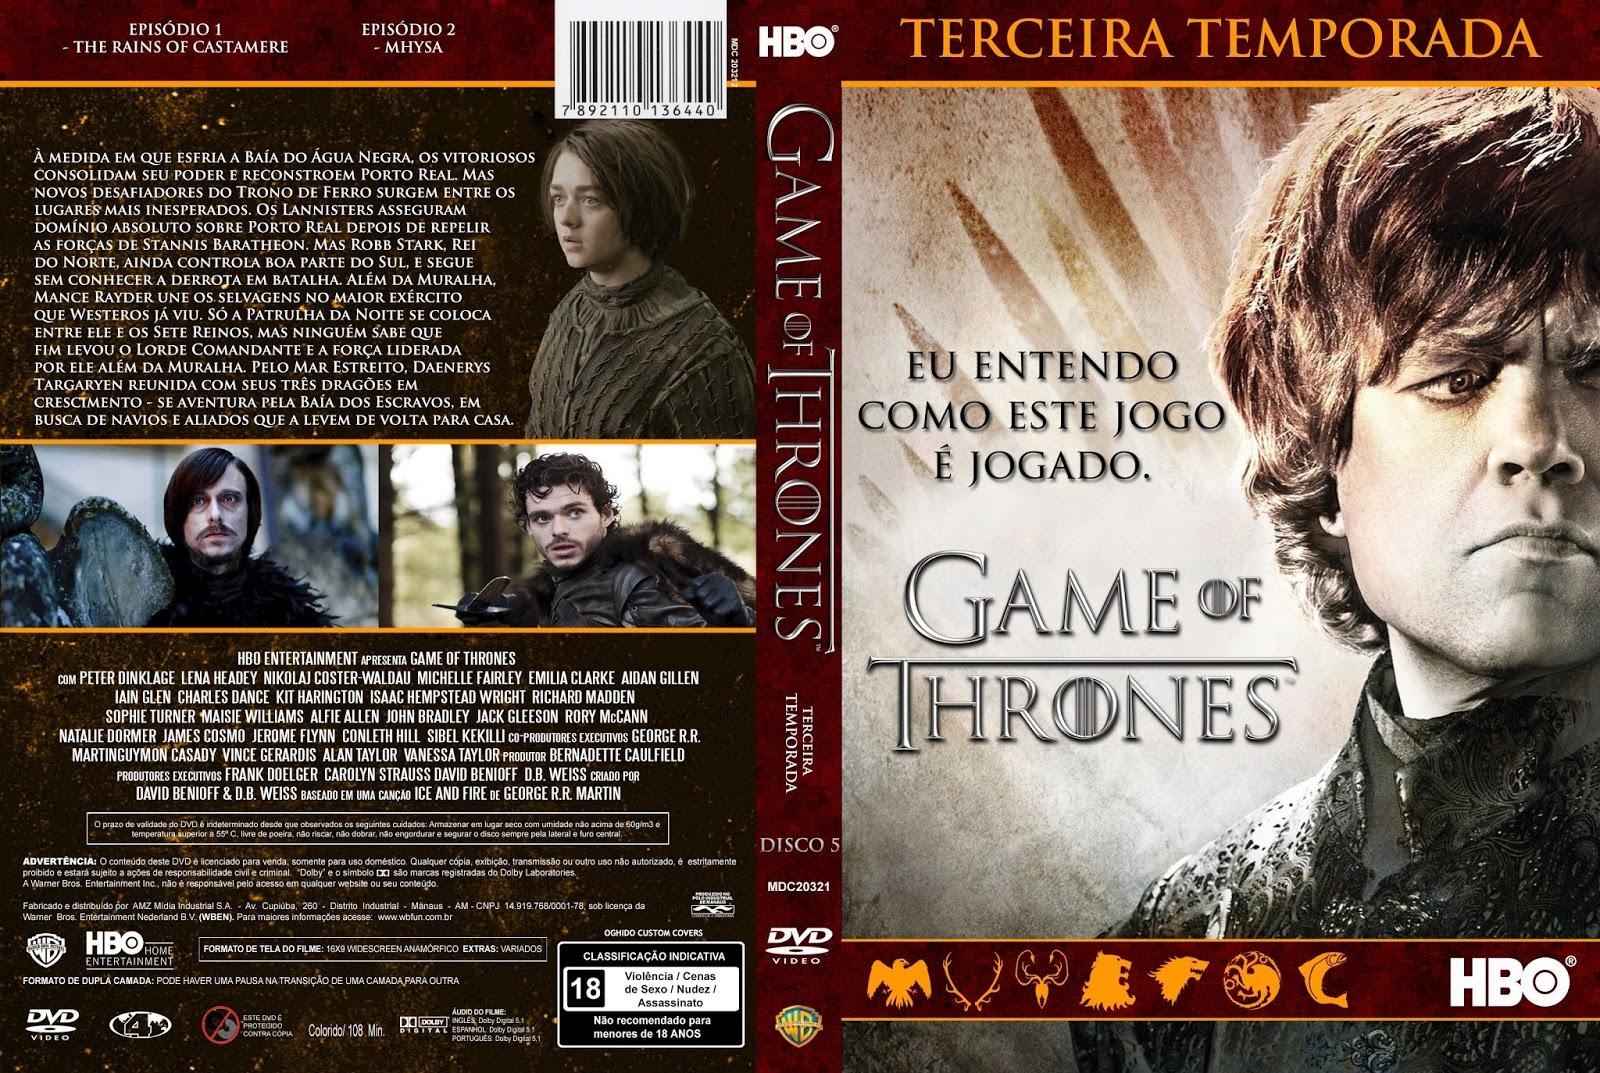 Game of thrones books vs series